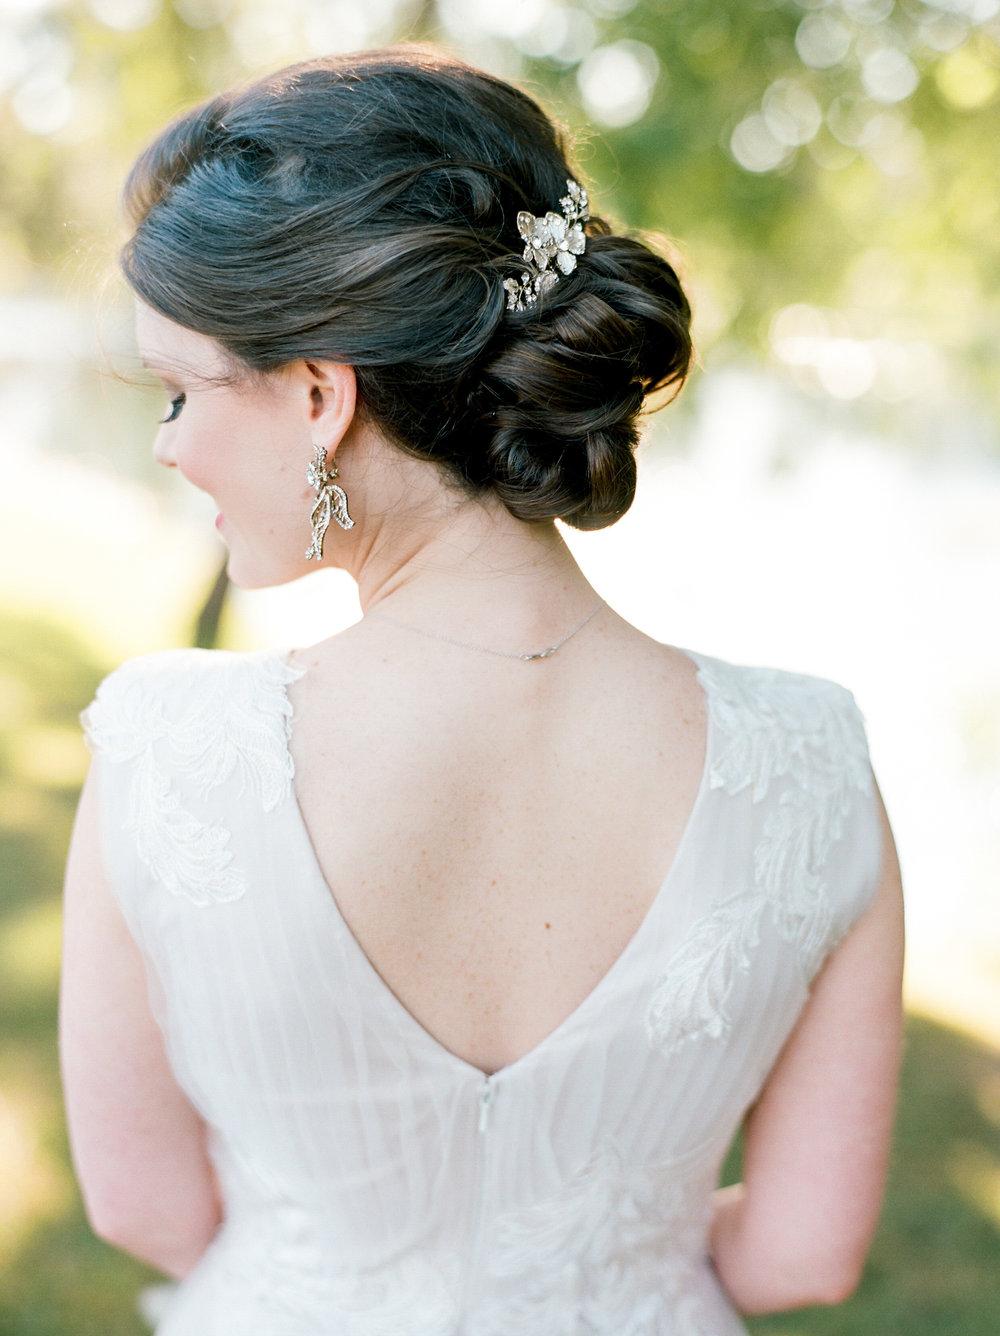 Houston-Wedding-Photographer-Lakeside-Country-Club-First-Look-Bride-Groom-Formals-Film-Fine-Art-Photography-14.jpg